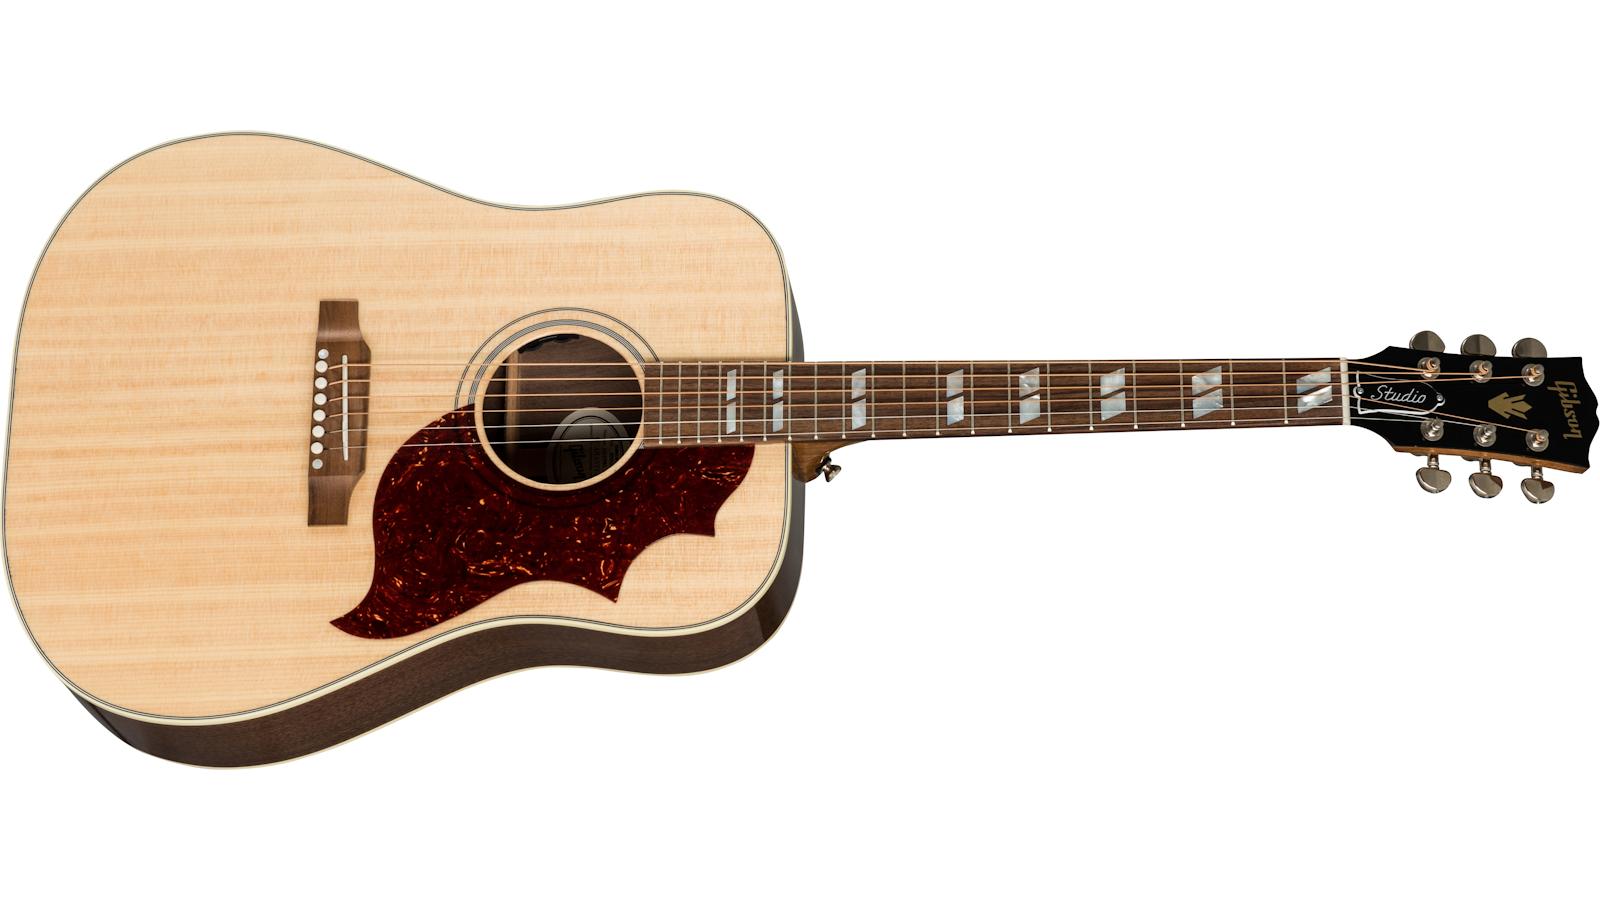 Gibson Hummingbird Studio Walnut - Antique Natural